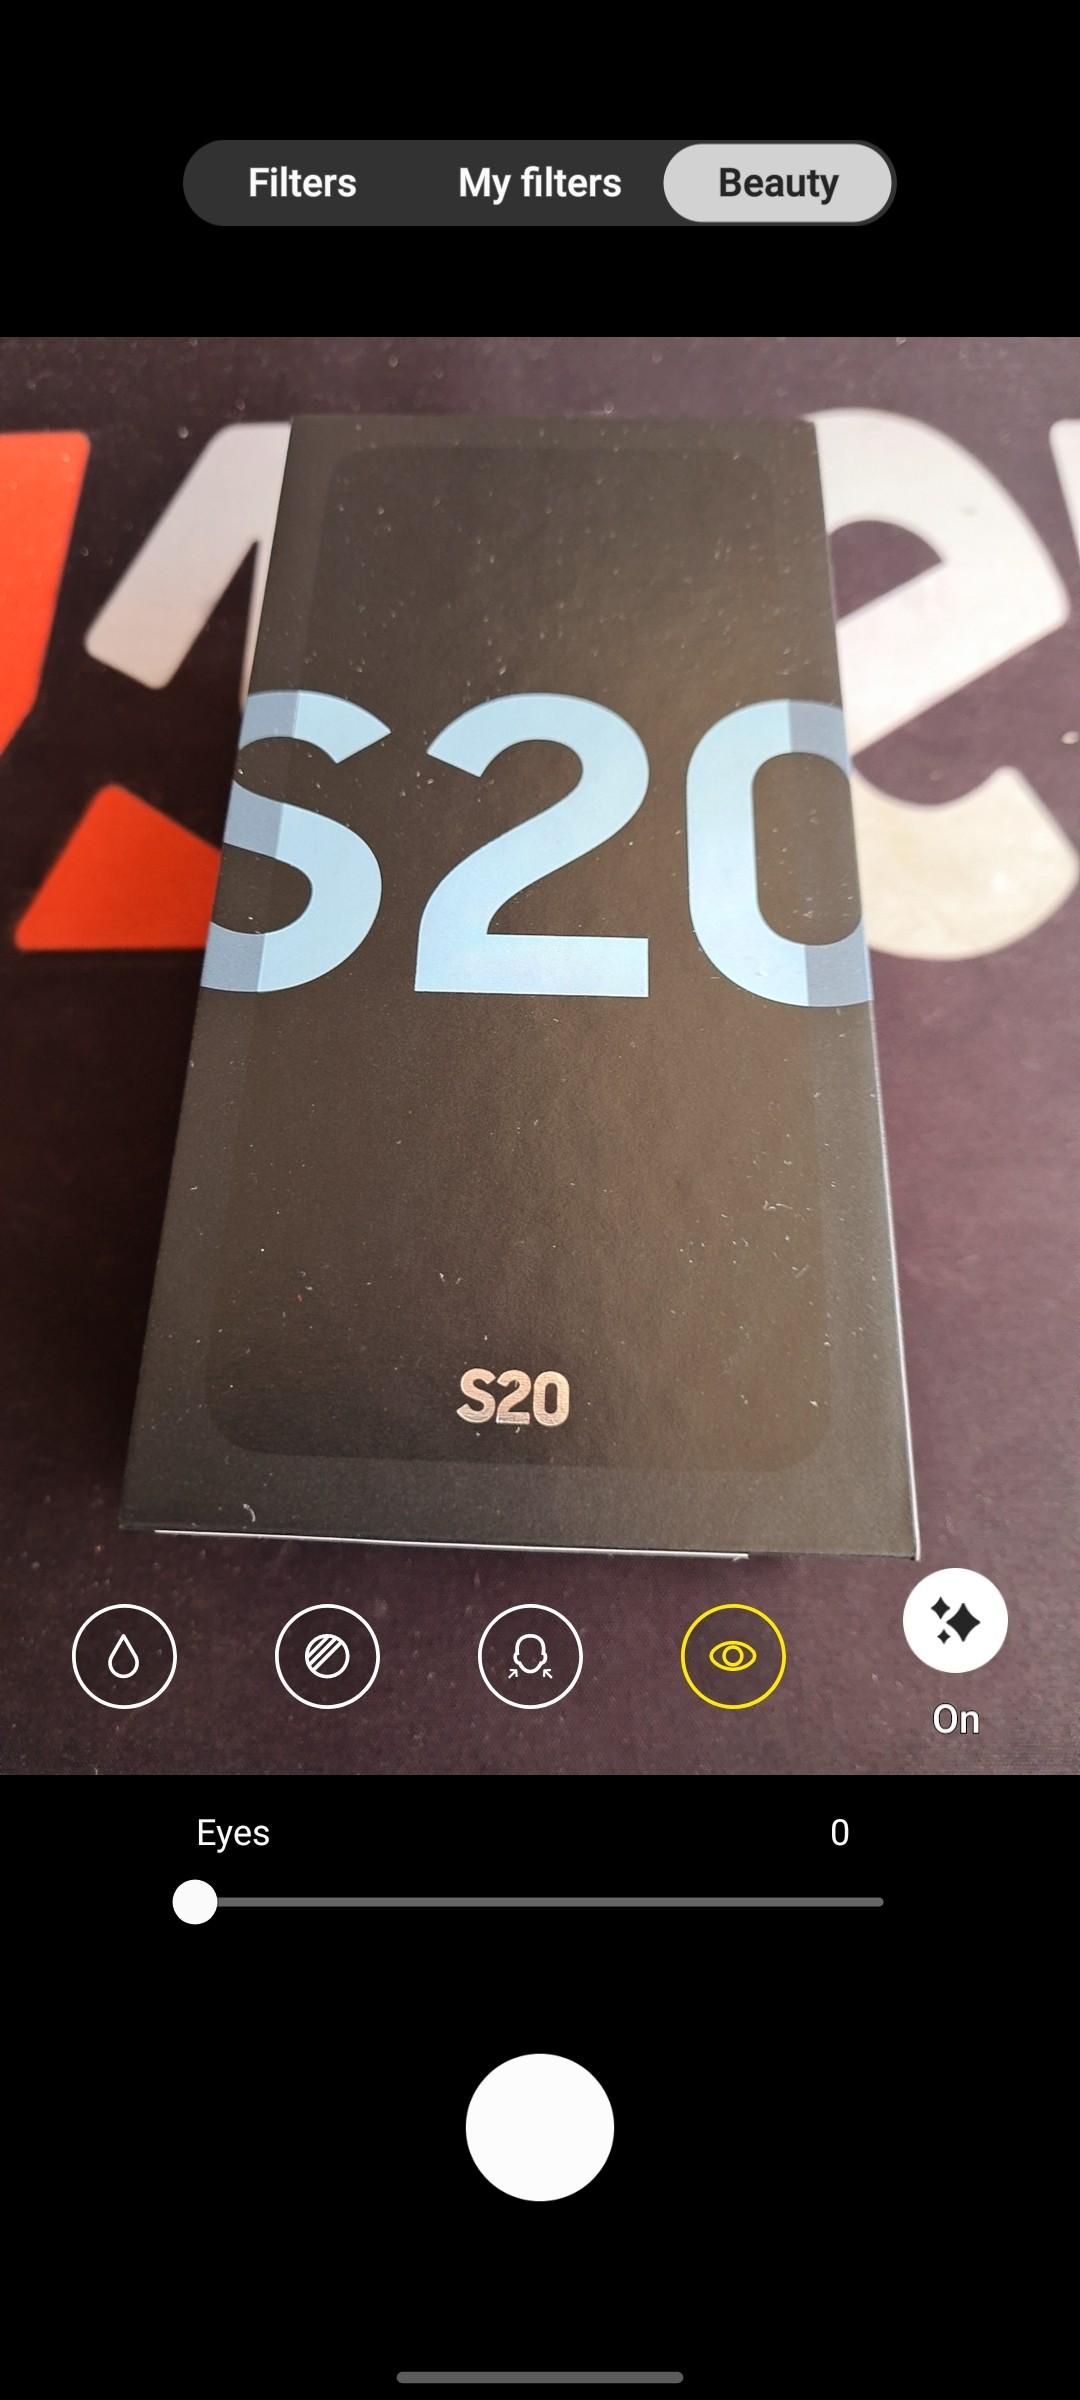 روکیدا - بررسی و نقد کامل گوشی گلکسی اس 20 سامسونگ + مقایسه تصاویر دوربین galaxy s20 - سامسونگ گلکسی S, نقد و بررسی گوشی موبایل, گلکسی اس 20, گلکسی اس 20 سامسونگ, گوشی Galaxy s20, گوشی های هوشمند, گوشی هوشمند